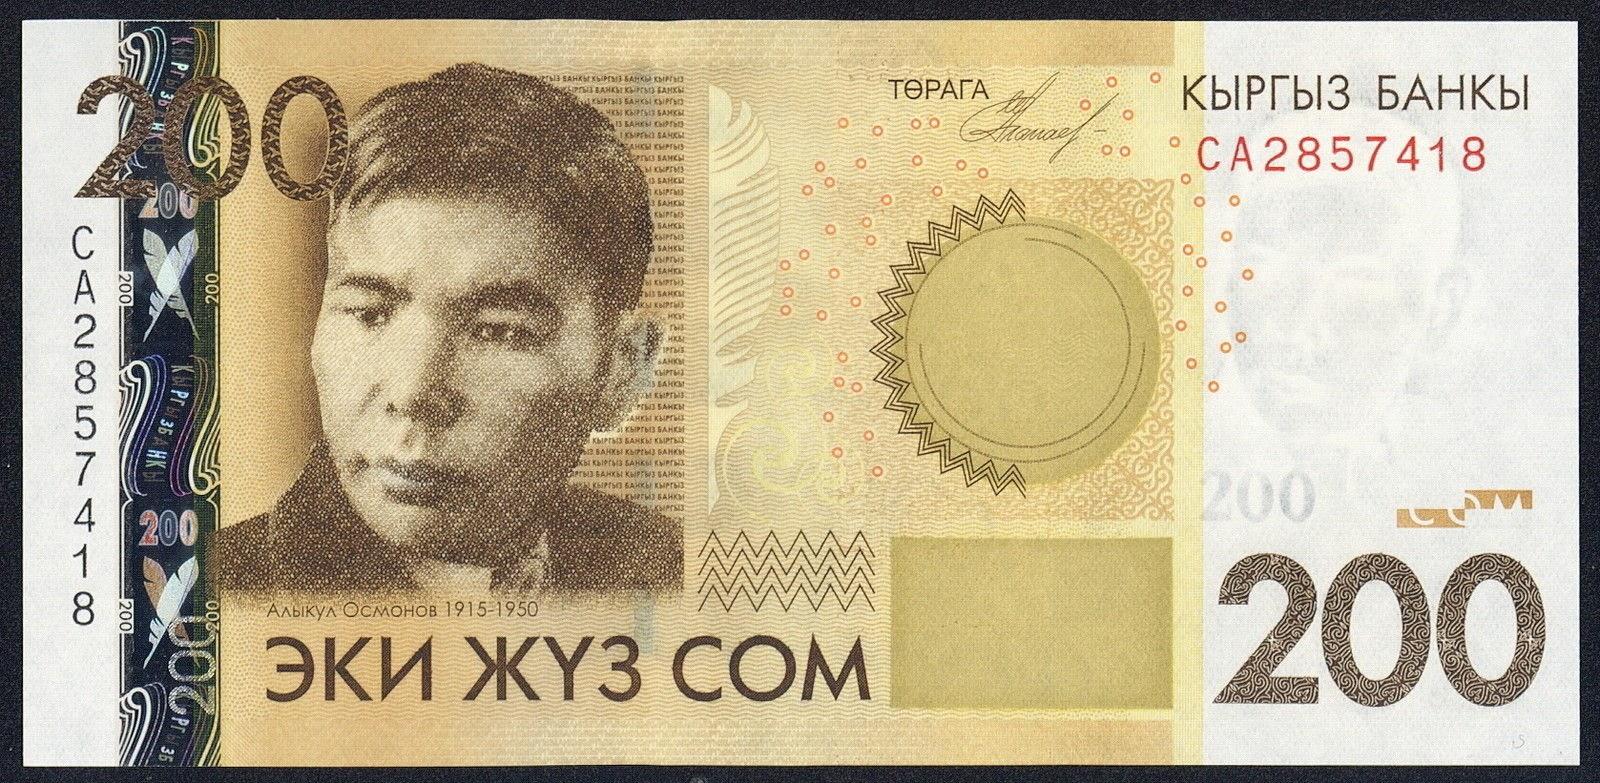 Kyrgyzstan currency 200 Som banknote 2010